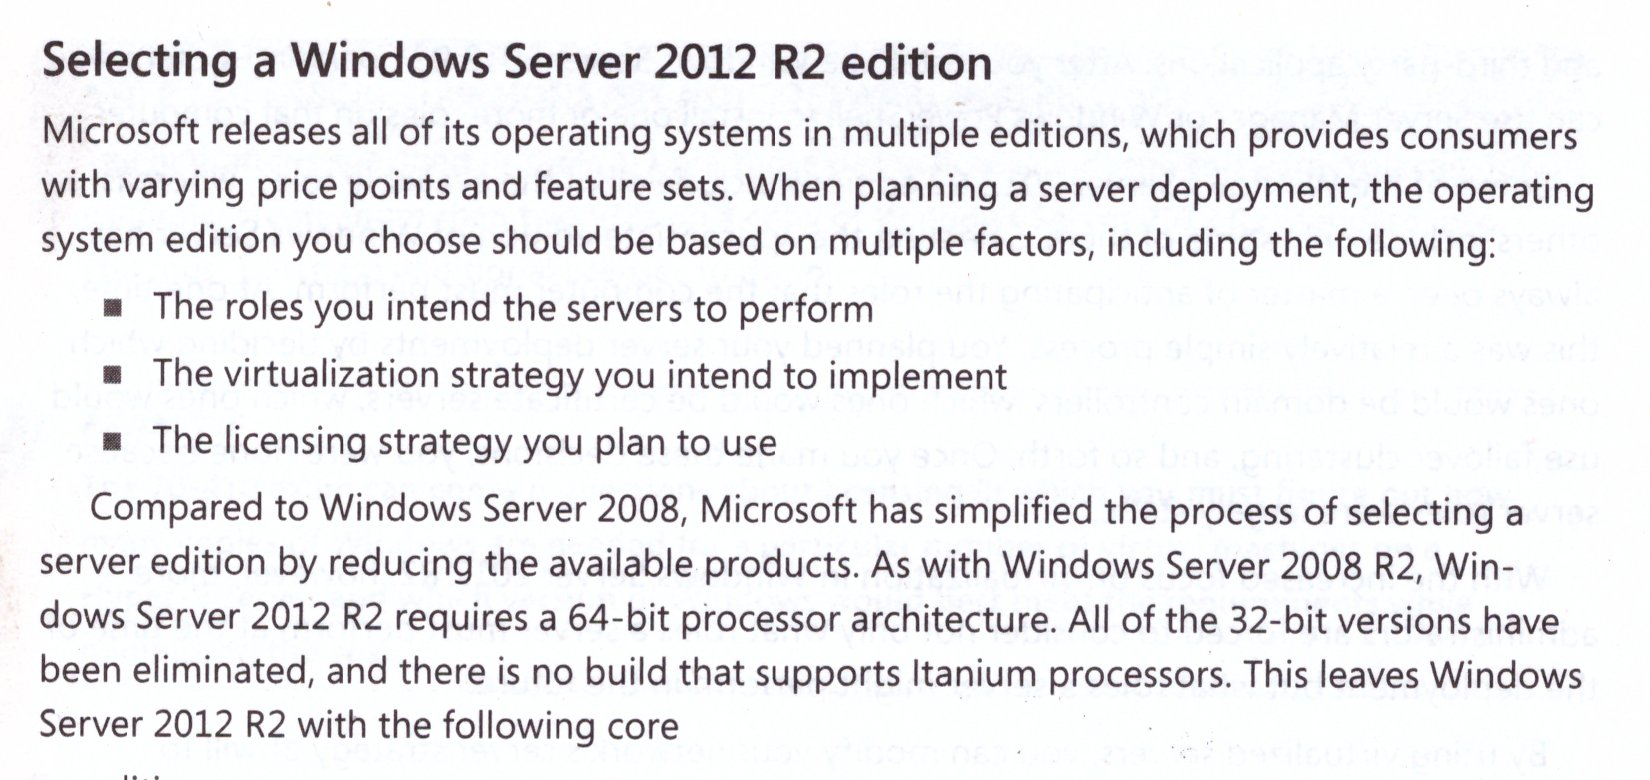 book ref em sistema operacional 64 bits drivers de 32 bits tem que ser desinstalados (eliminados)